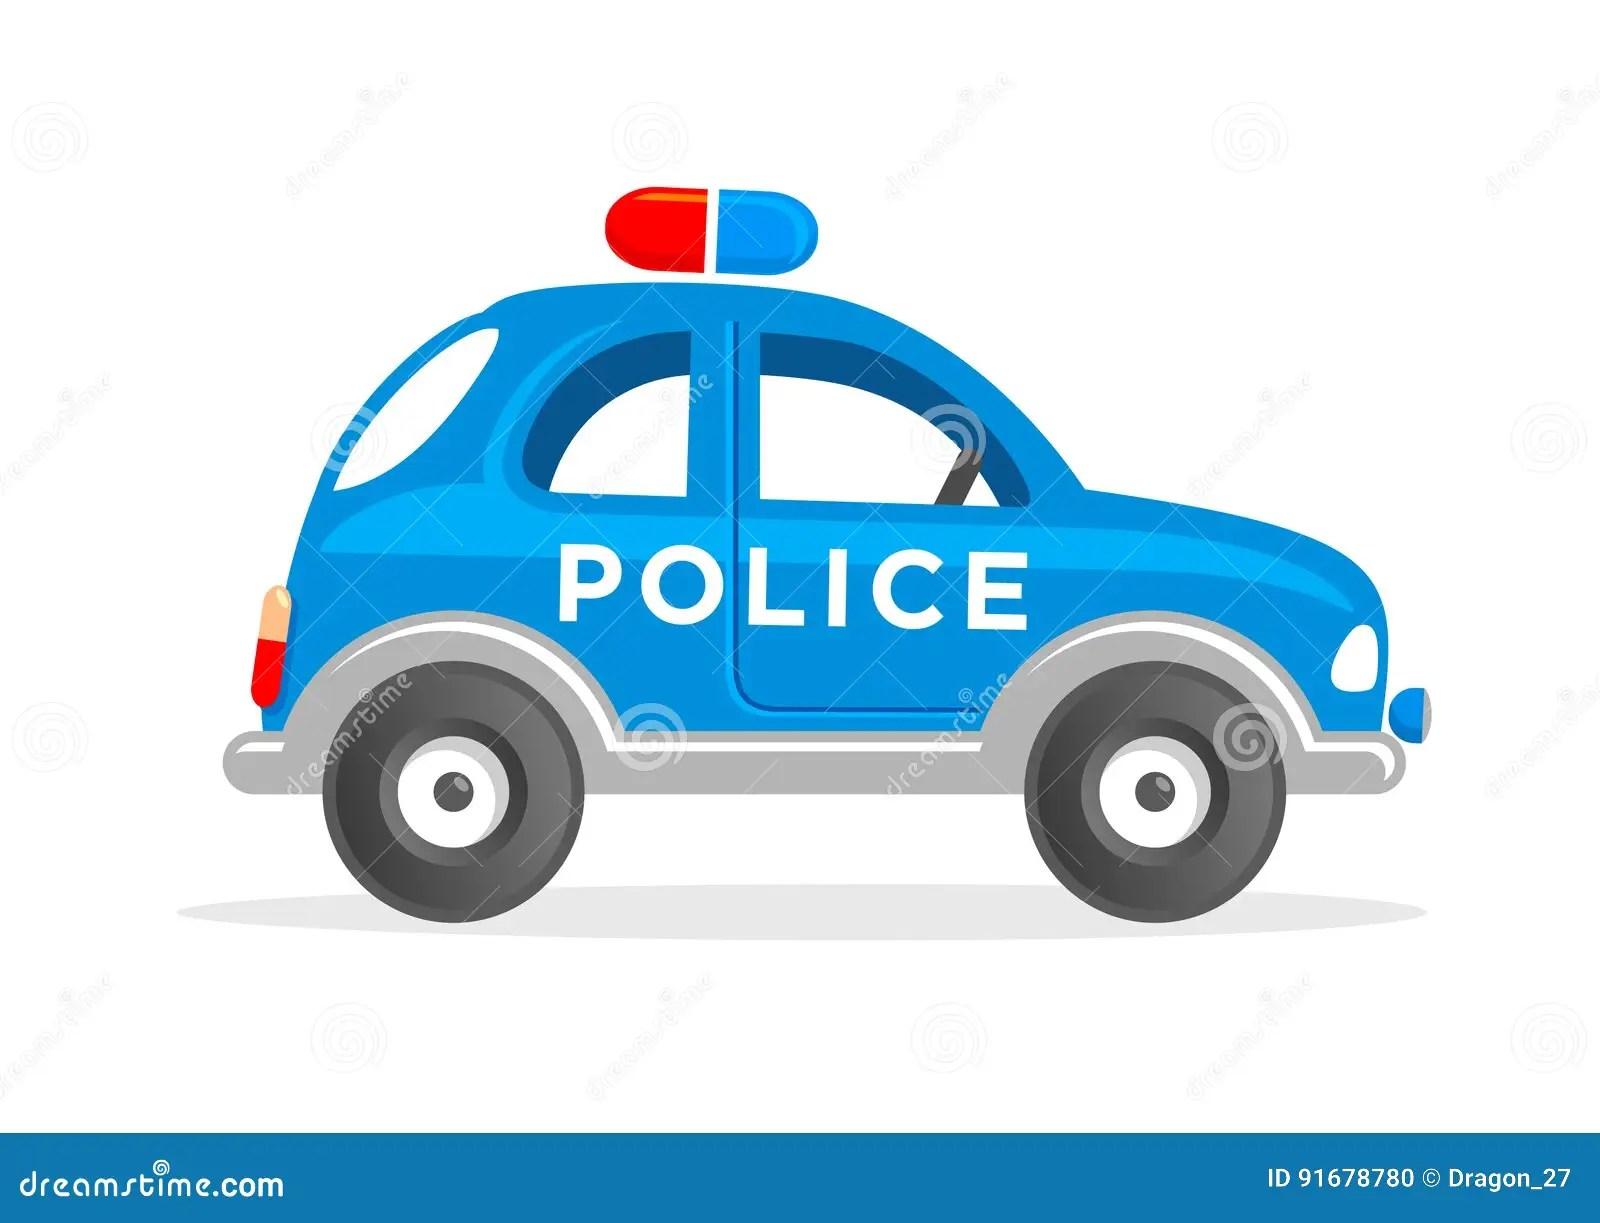 Cartoon Toy Police Car Vector Illustration Stock Vector Illustration Of Kids Police 91678780